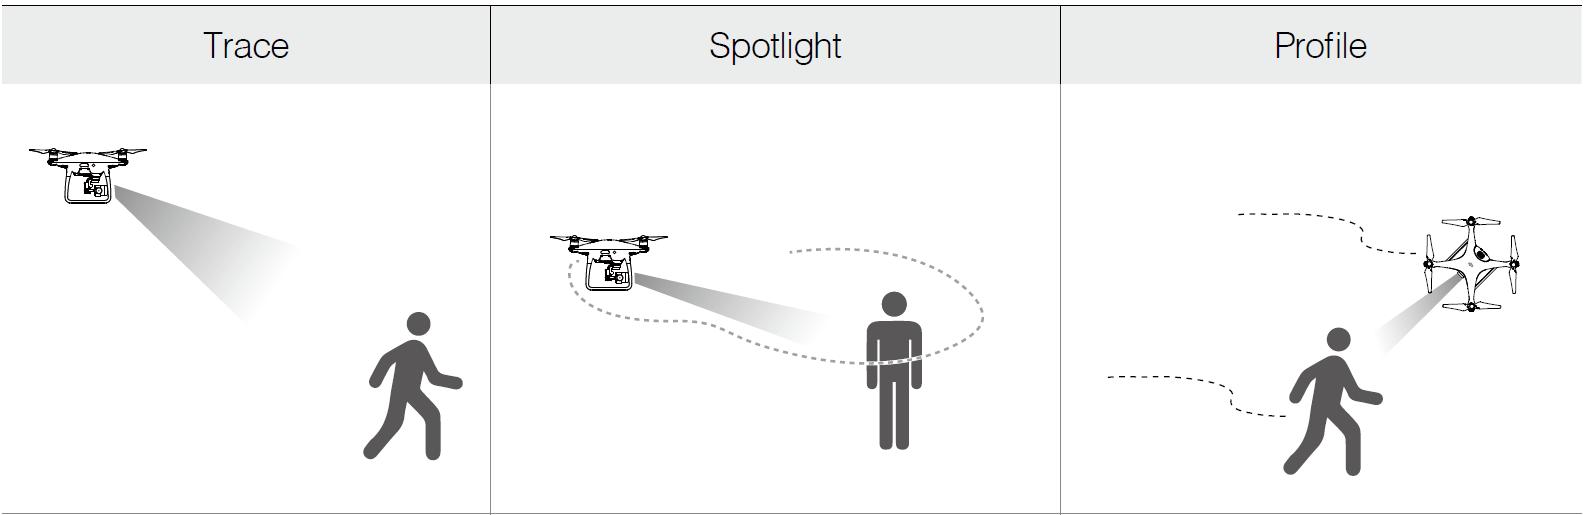 Follow me drone - phantom 4 pro activetrack submodes